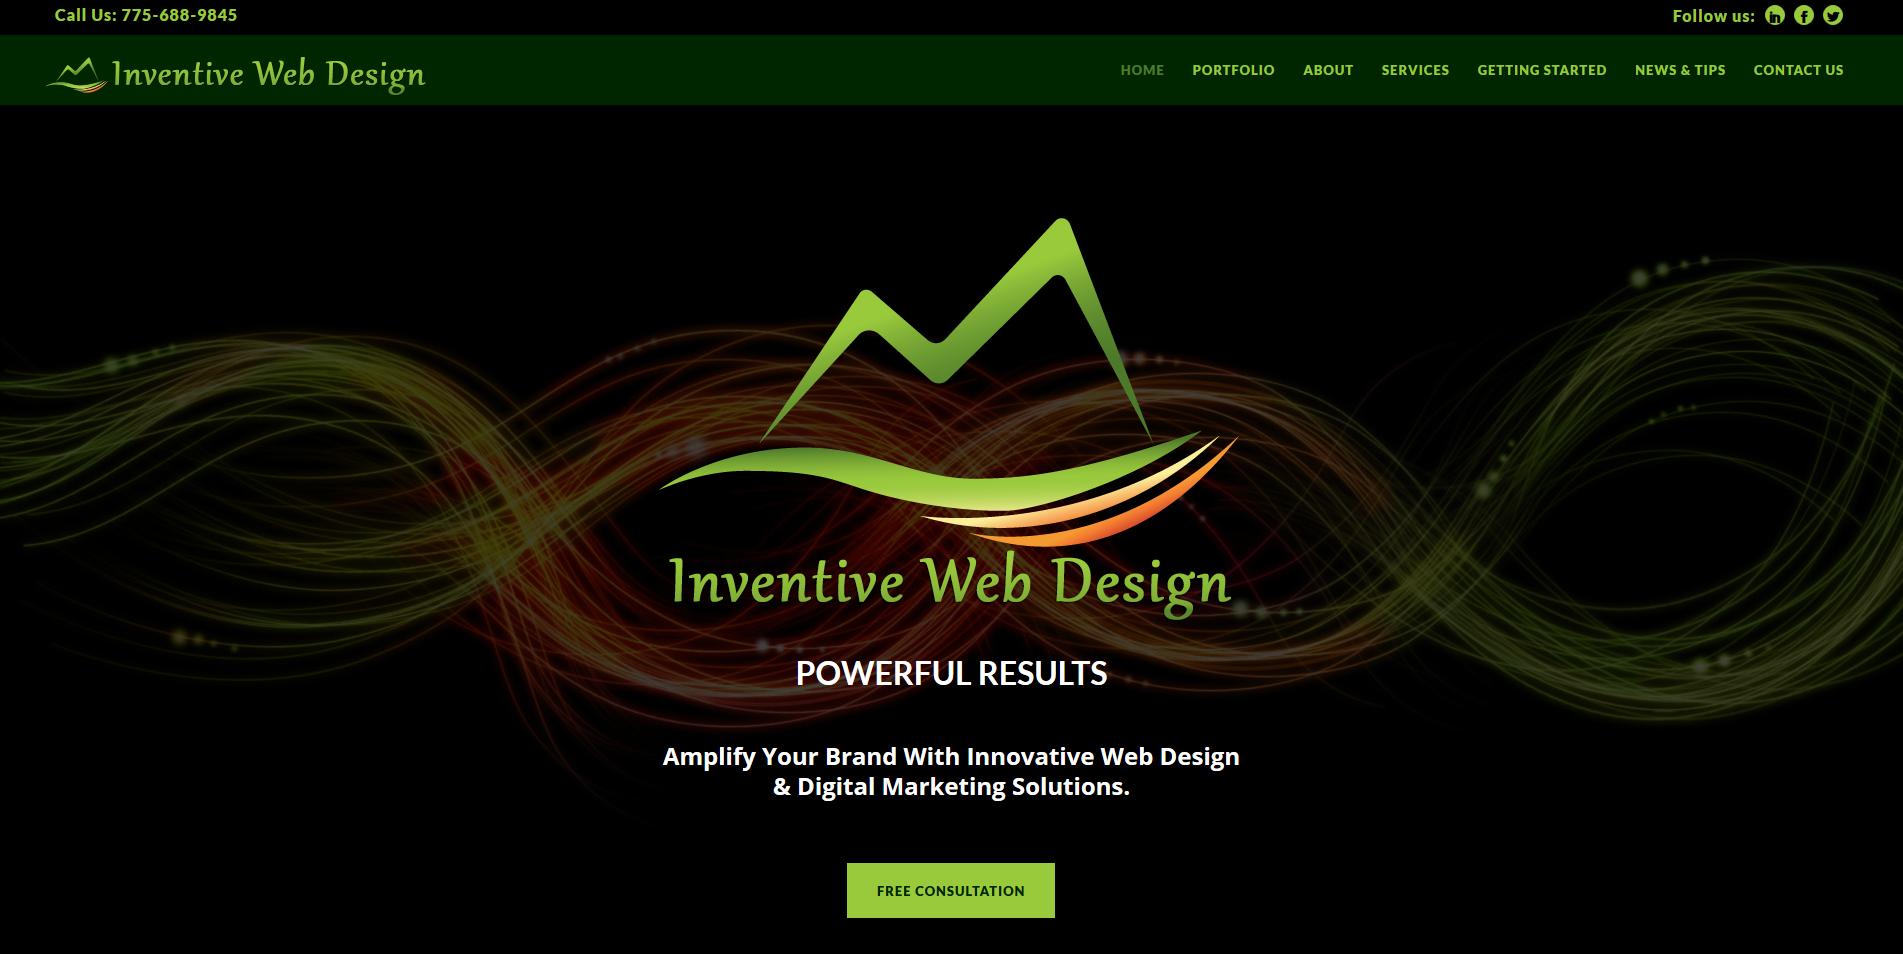 Inventive Web Design - New Website